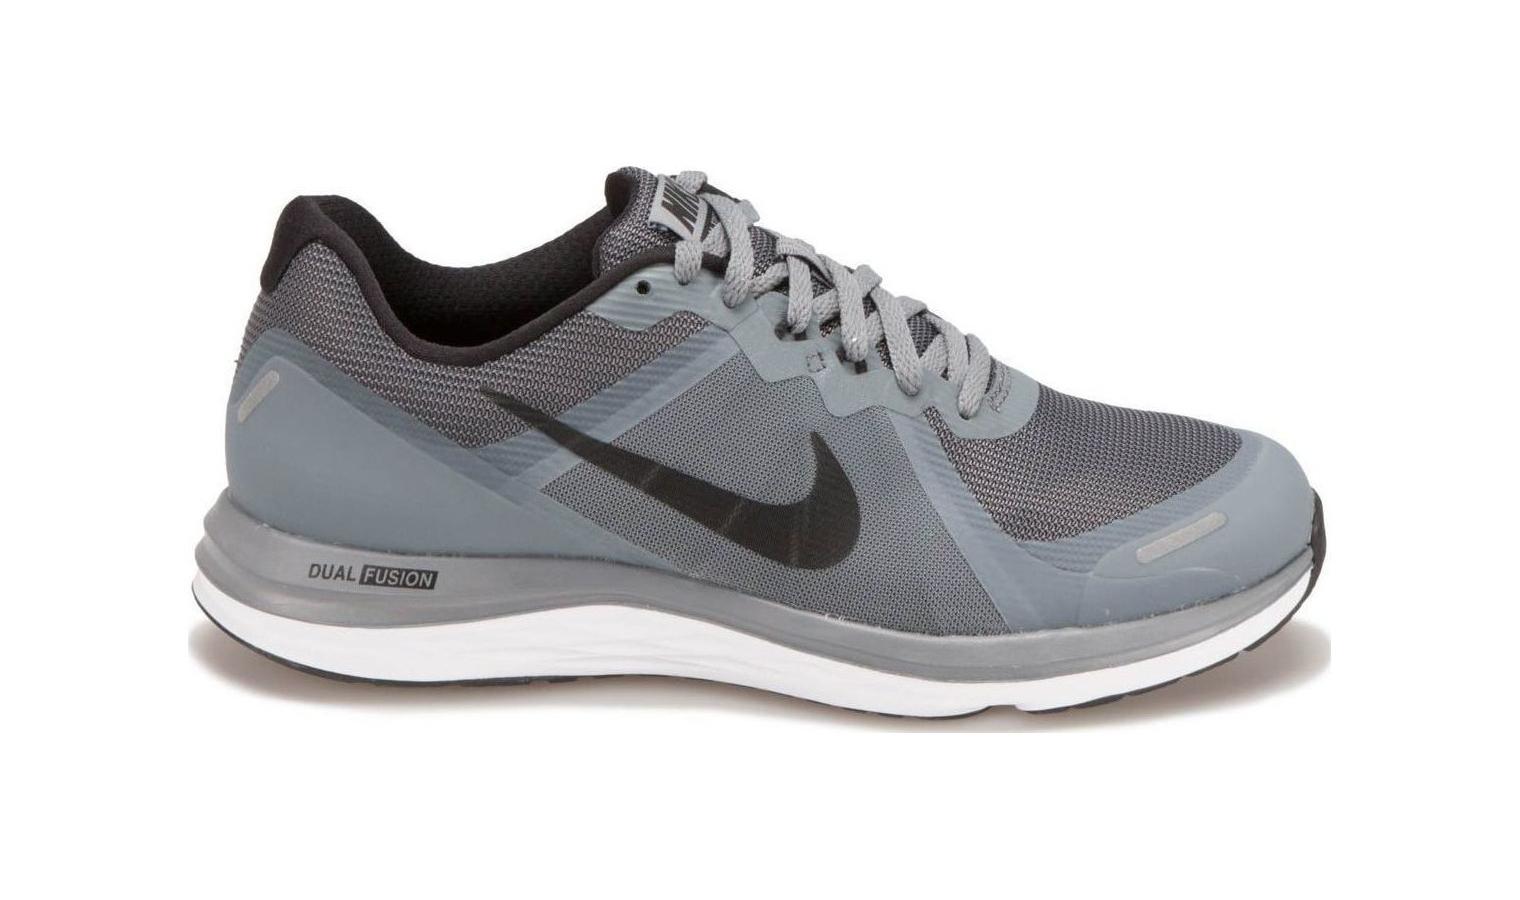 71fa281b6ab8 Pánske bežecké topánky Nike DUAL FUSION X 2 šedé